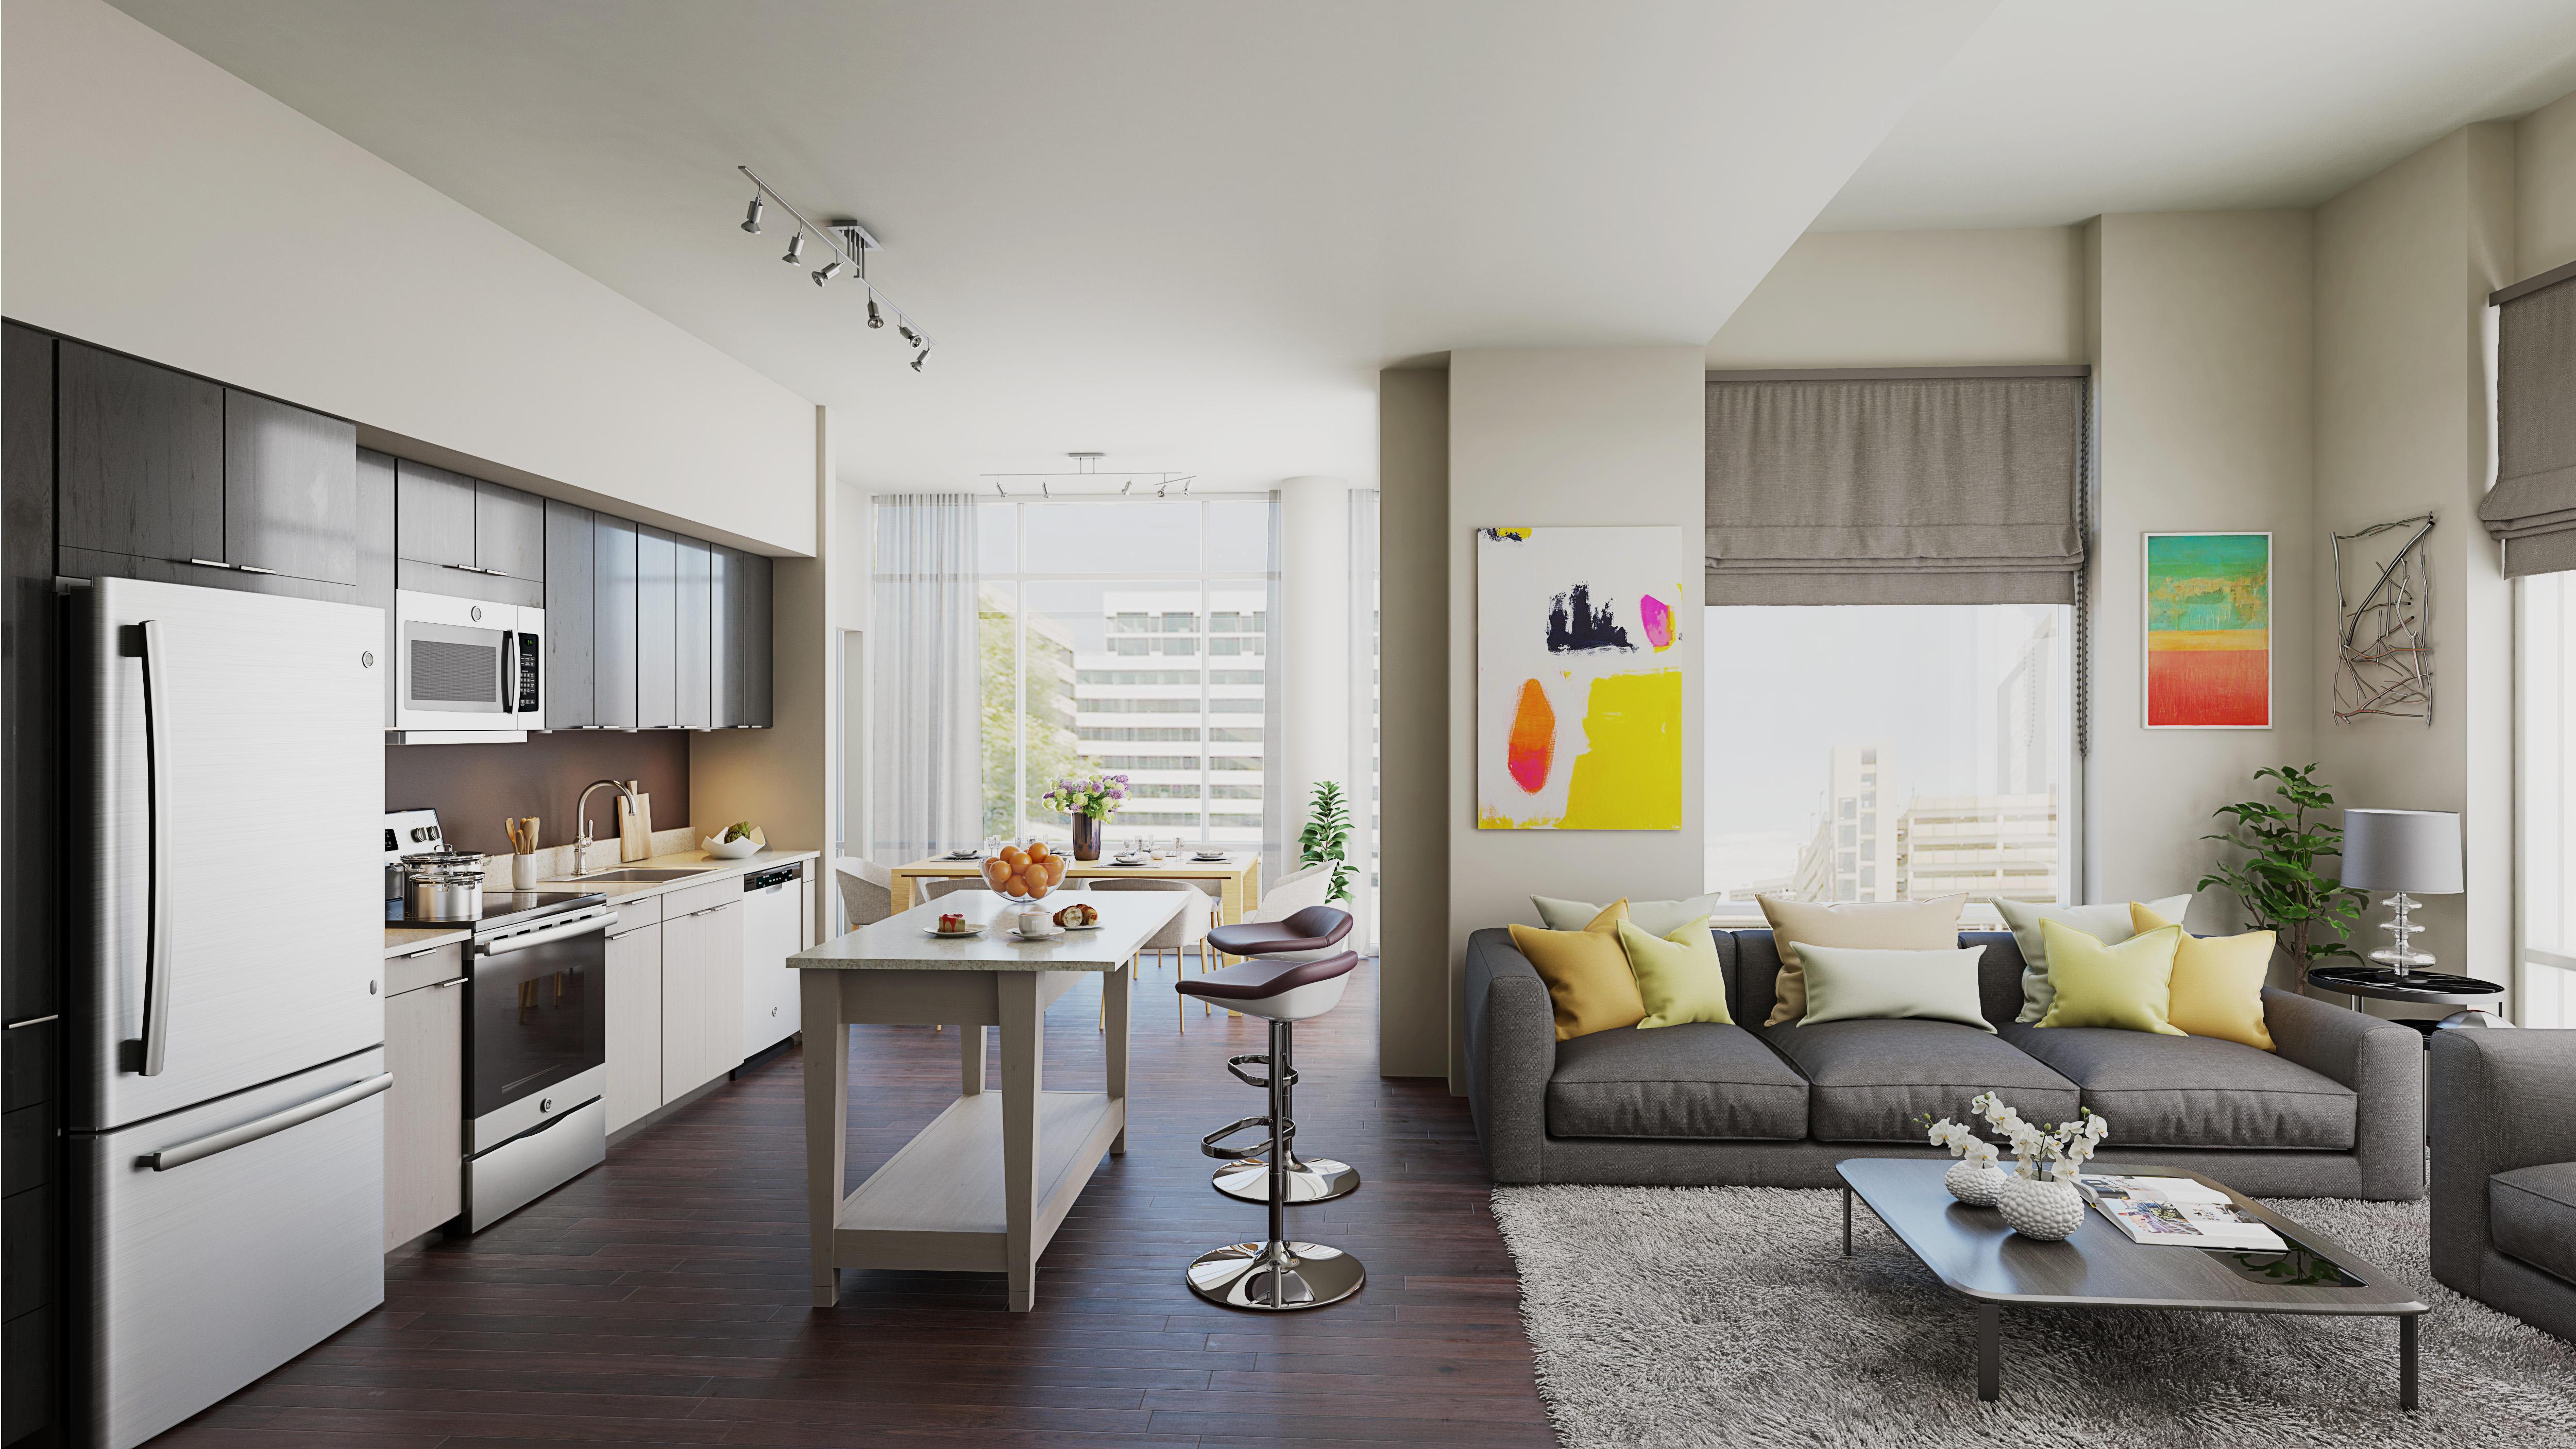 Solaire 8250 Apartments image 0